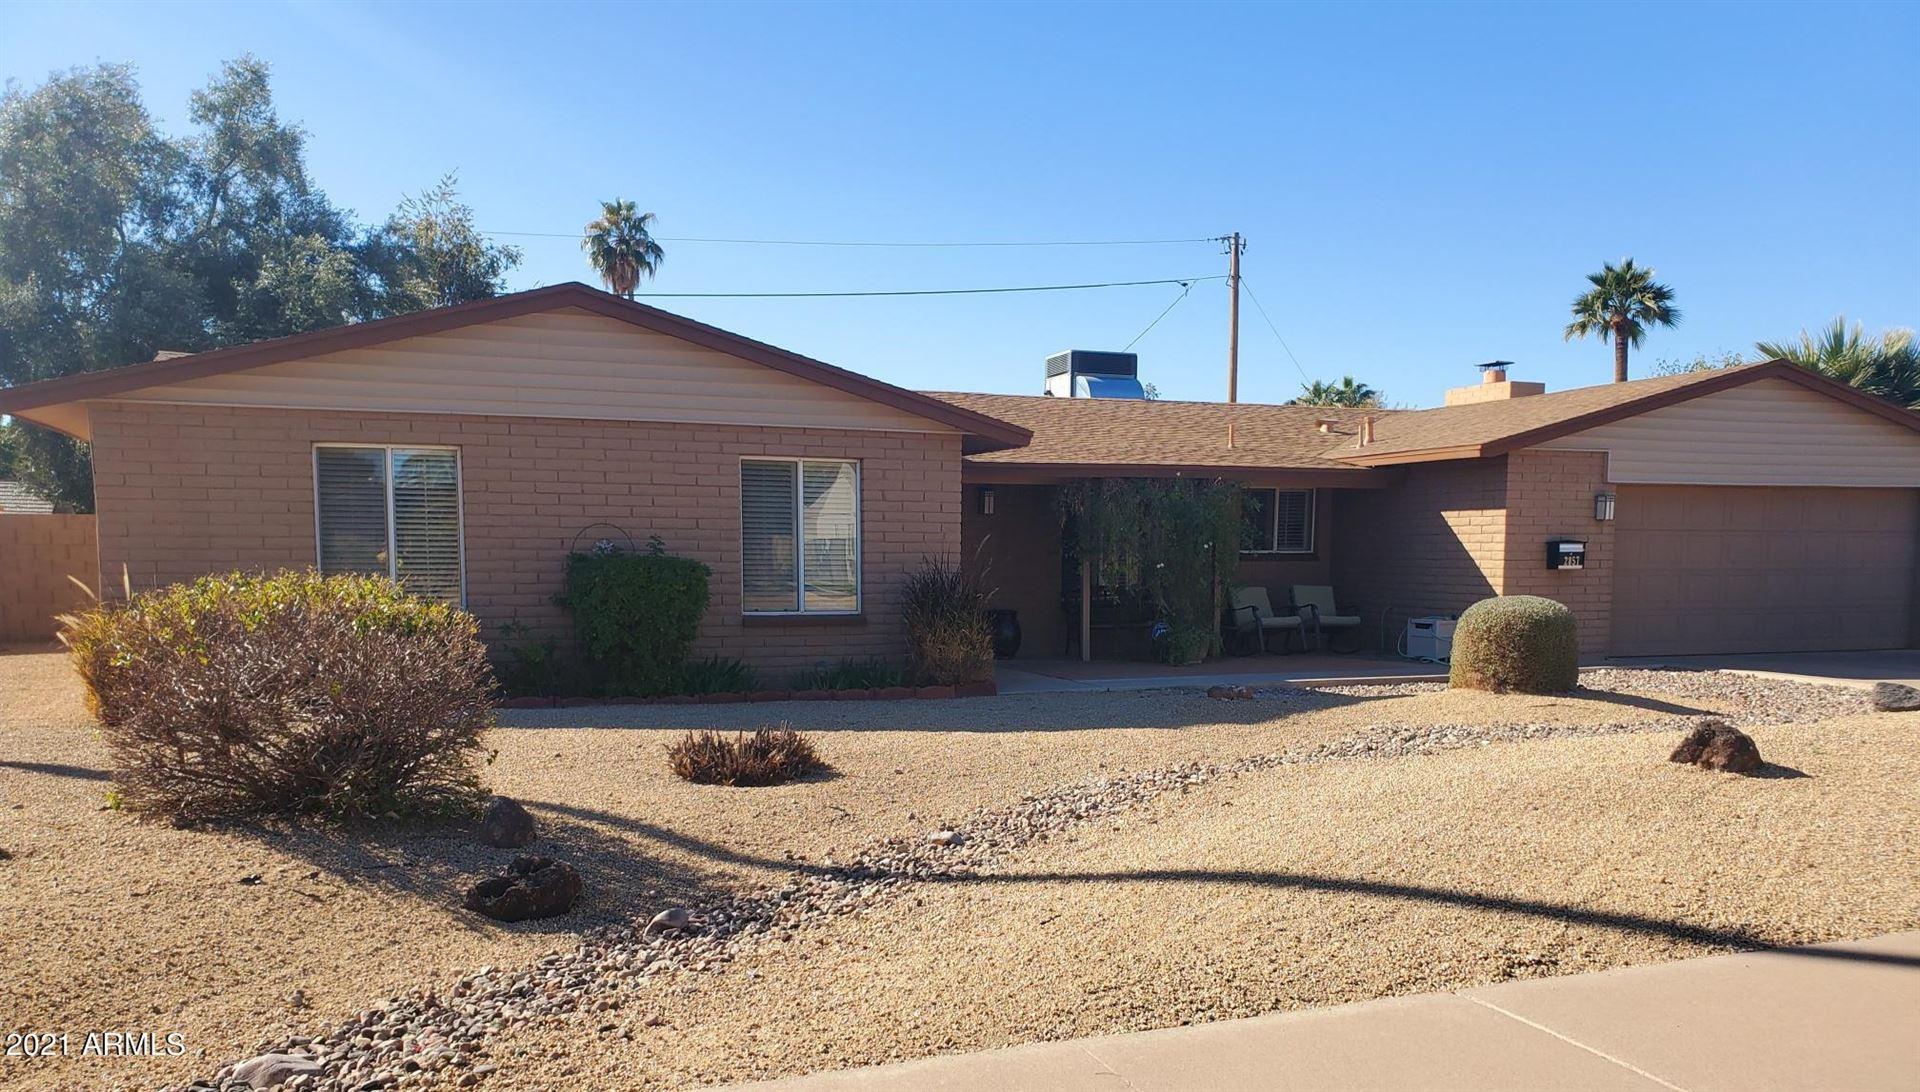 Photo of 2857 E BERYL Avenue, Phoenix, AZ 85028 (MLS # 6198256)